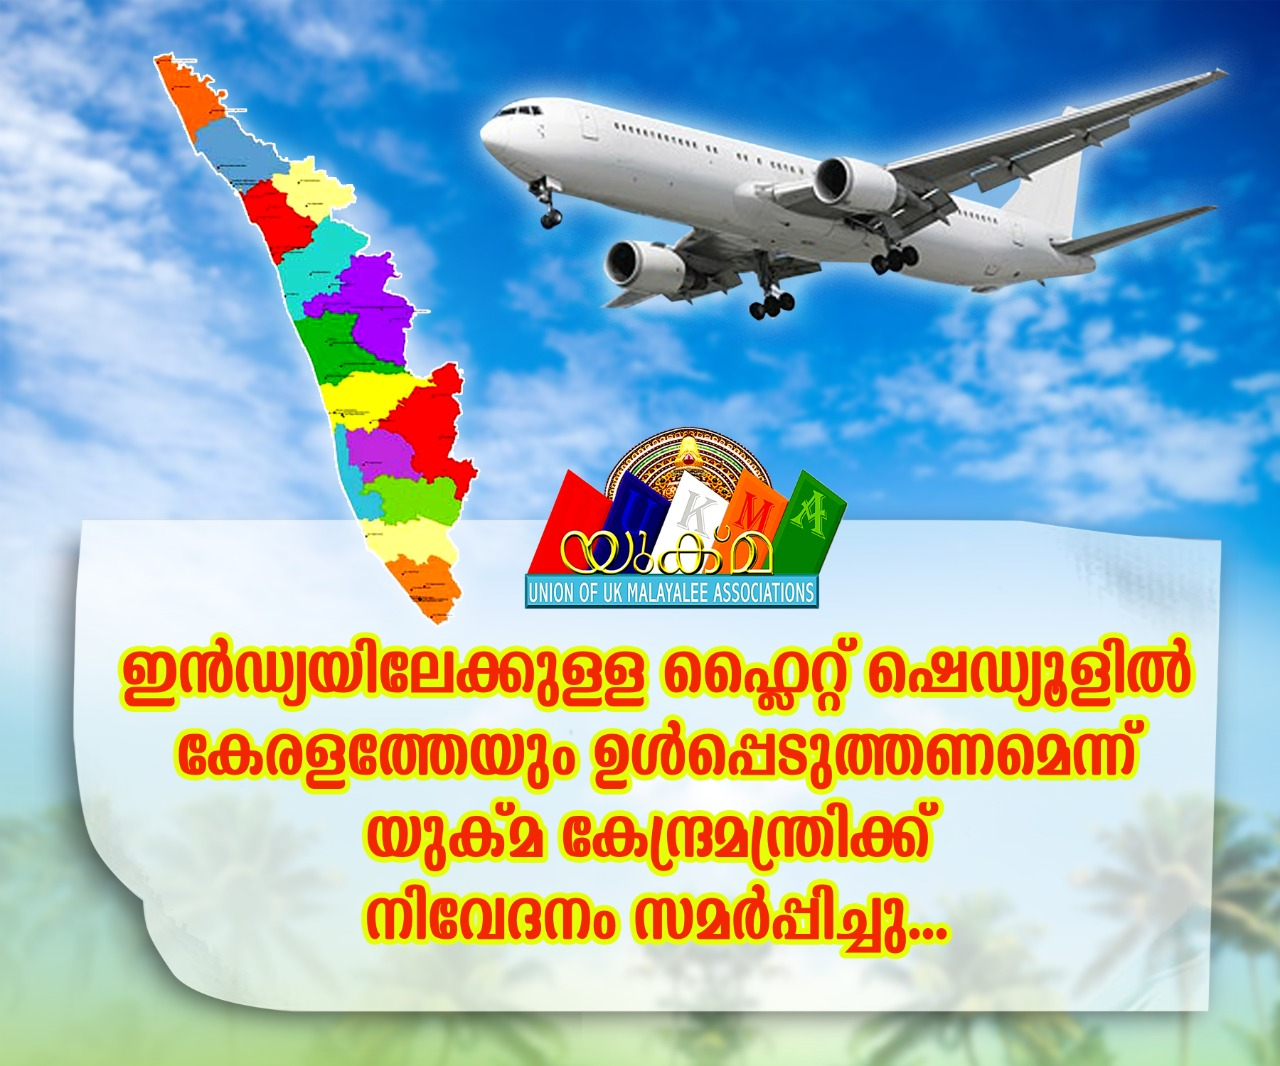 https://uukmanews.com/flightschedule-uukmapetetion-centralminister070520/